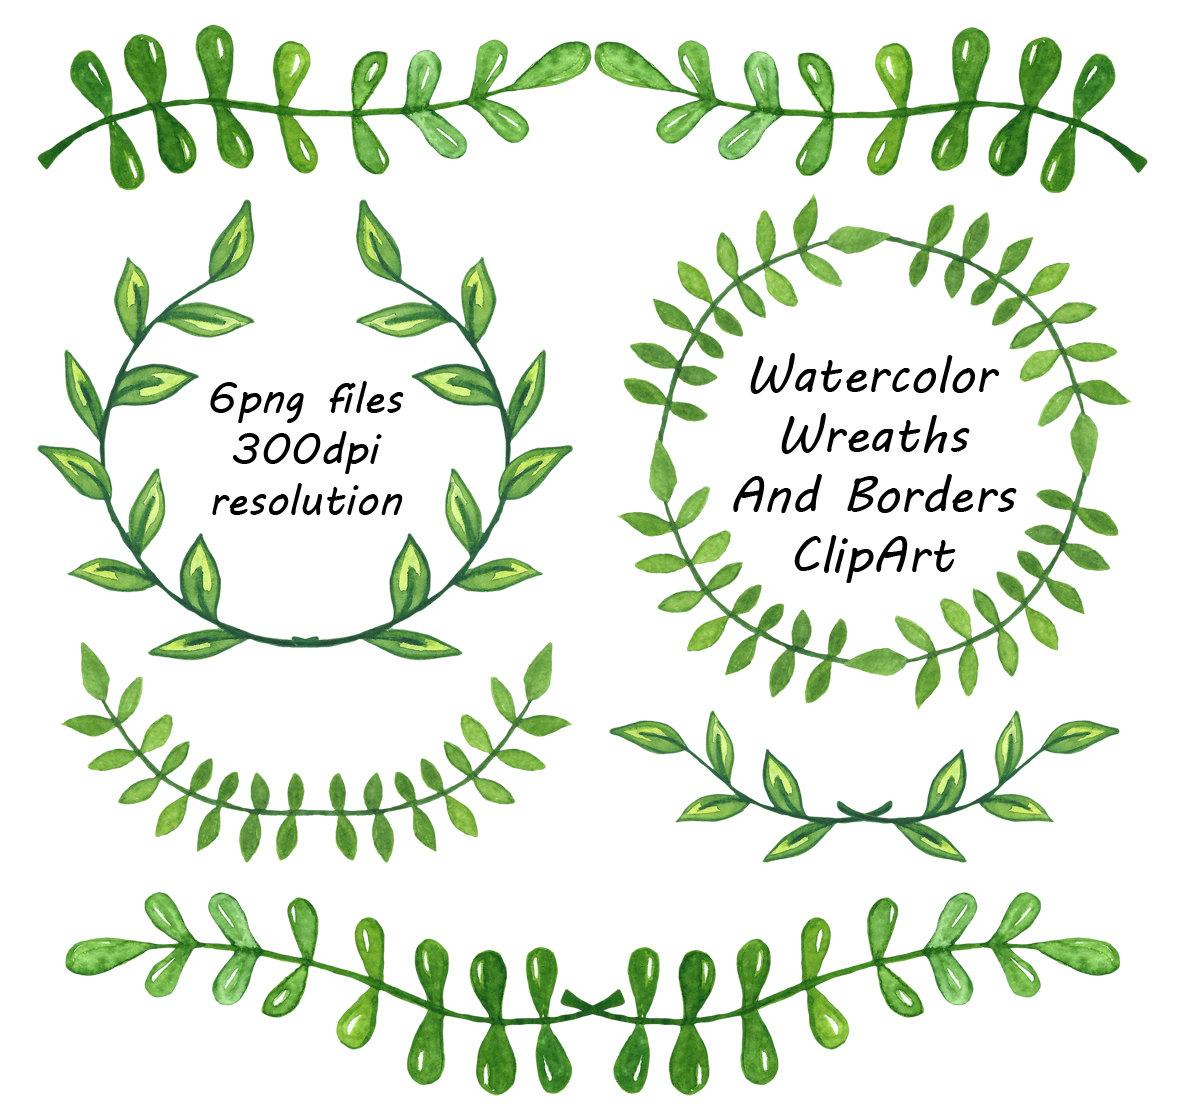 Watercolor Wreaths And Borders clipart Laurel Wreath laurel.